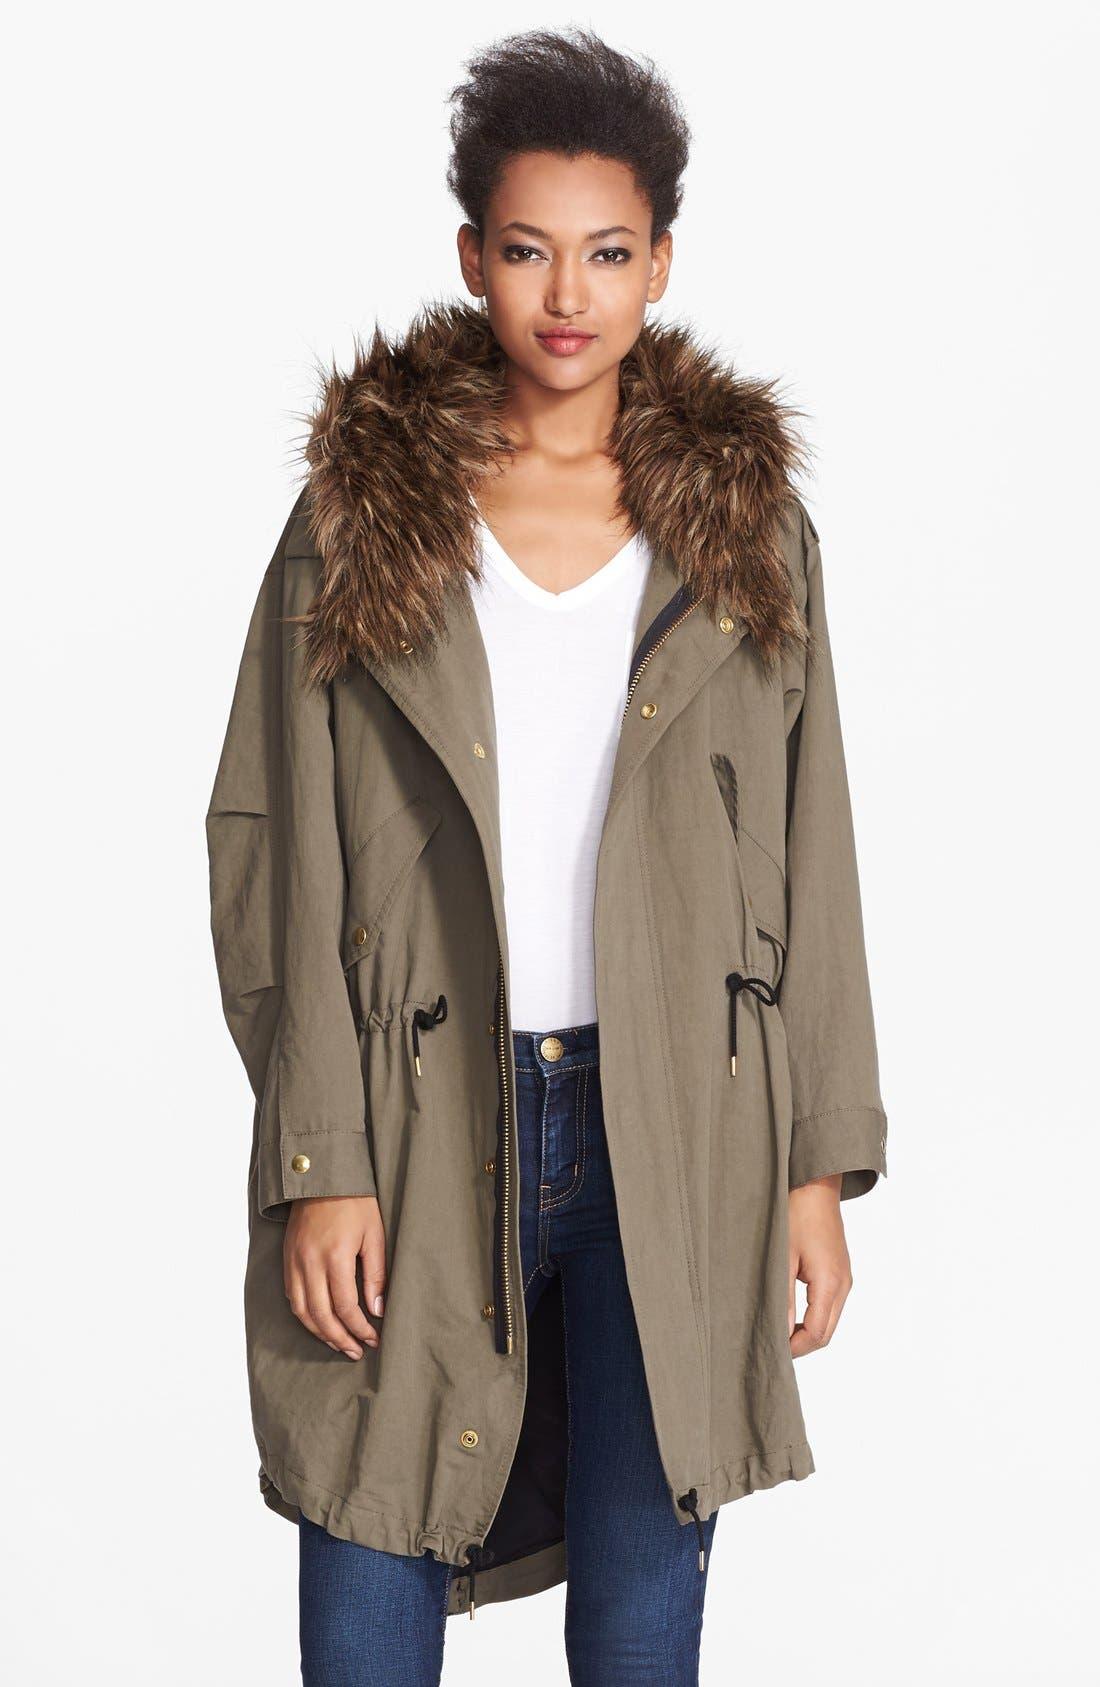 Alternate Image 1 Selected - Smythe Oversized Anorak with Faux Fur Hood